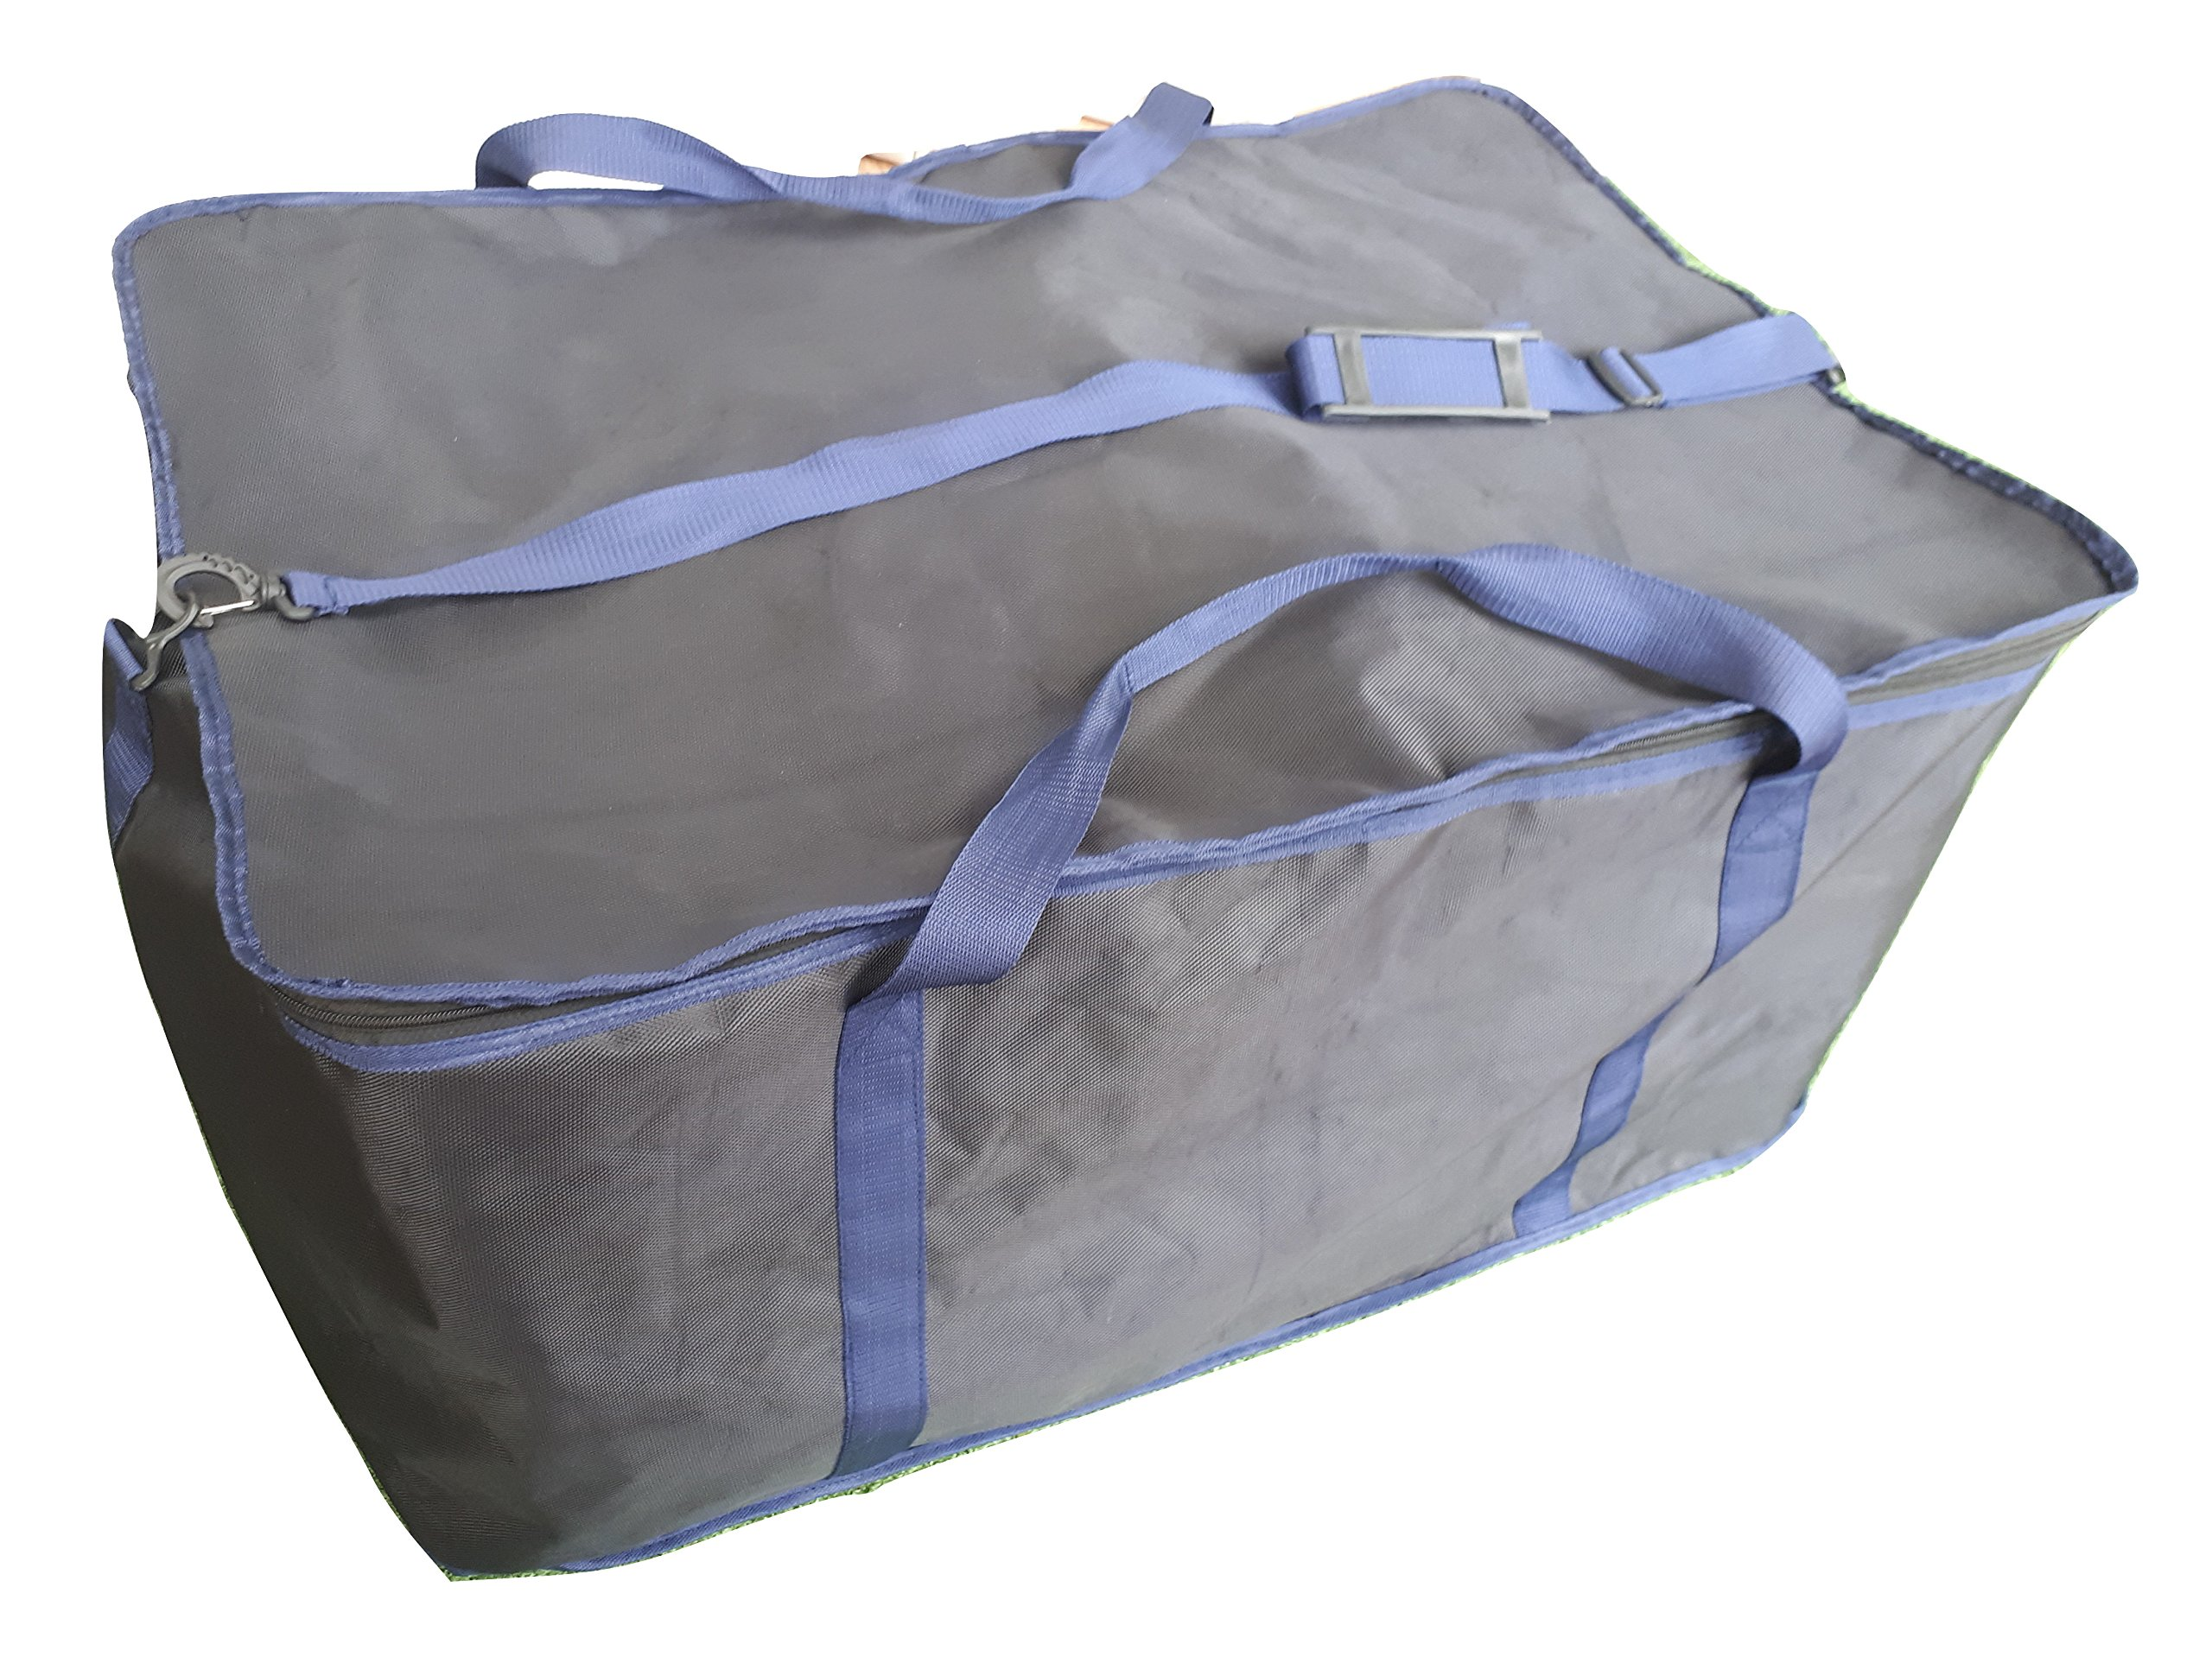 RC Car Bag XXL, RC Carry Bag for 1:8/ 1:6 RC Cars incl Traxxas X Maxx / X-Maxx, E-Revo, E-Maxx. Easily store or transport your RC Car in this bag!